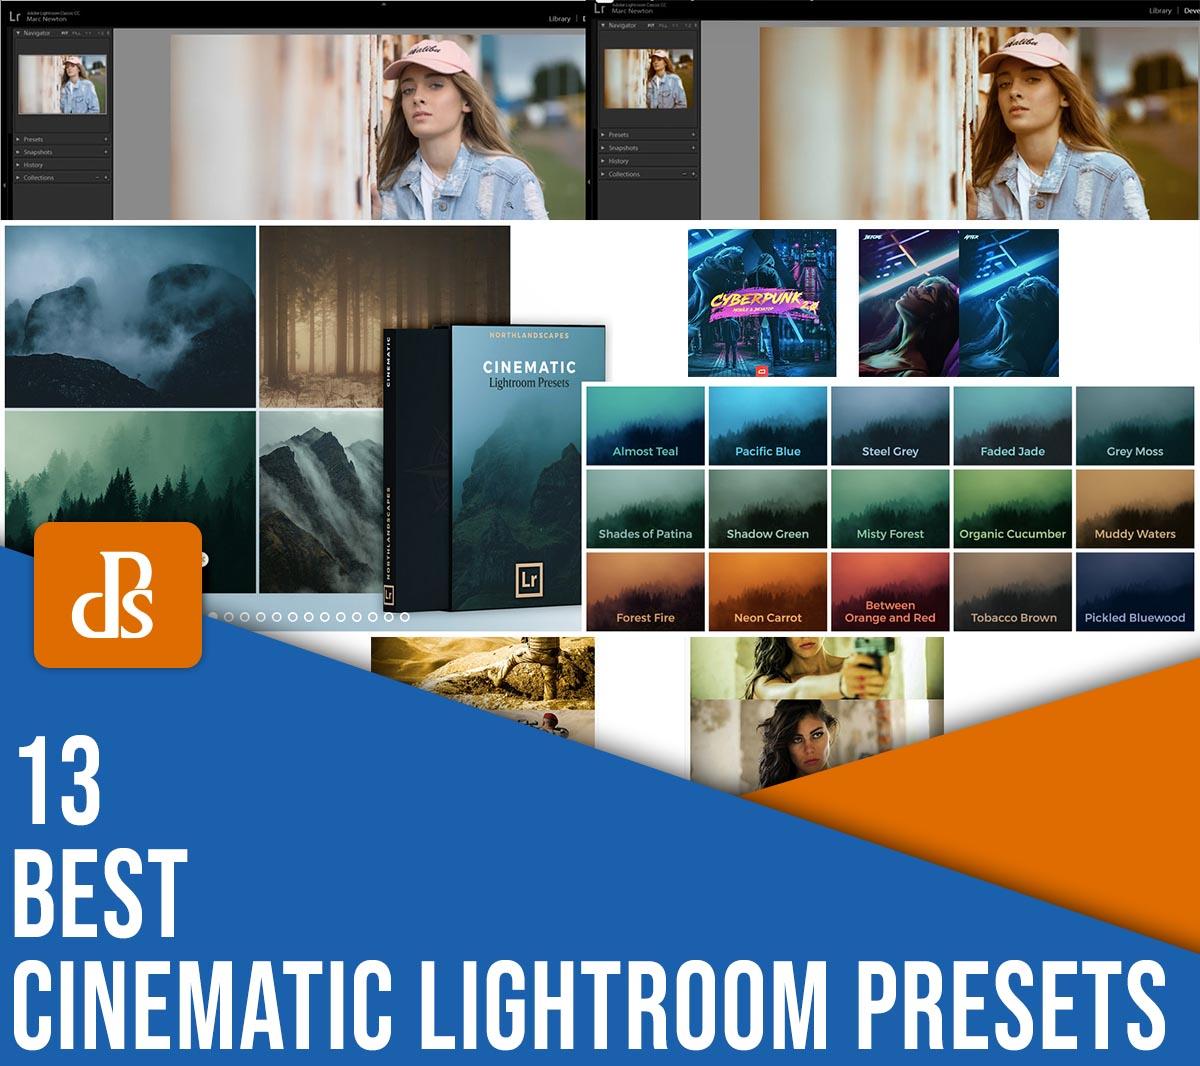 13 best cinematic Lightroom presets